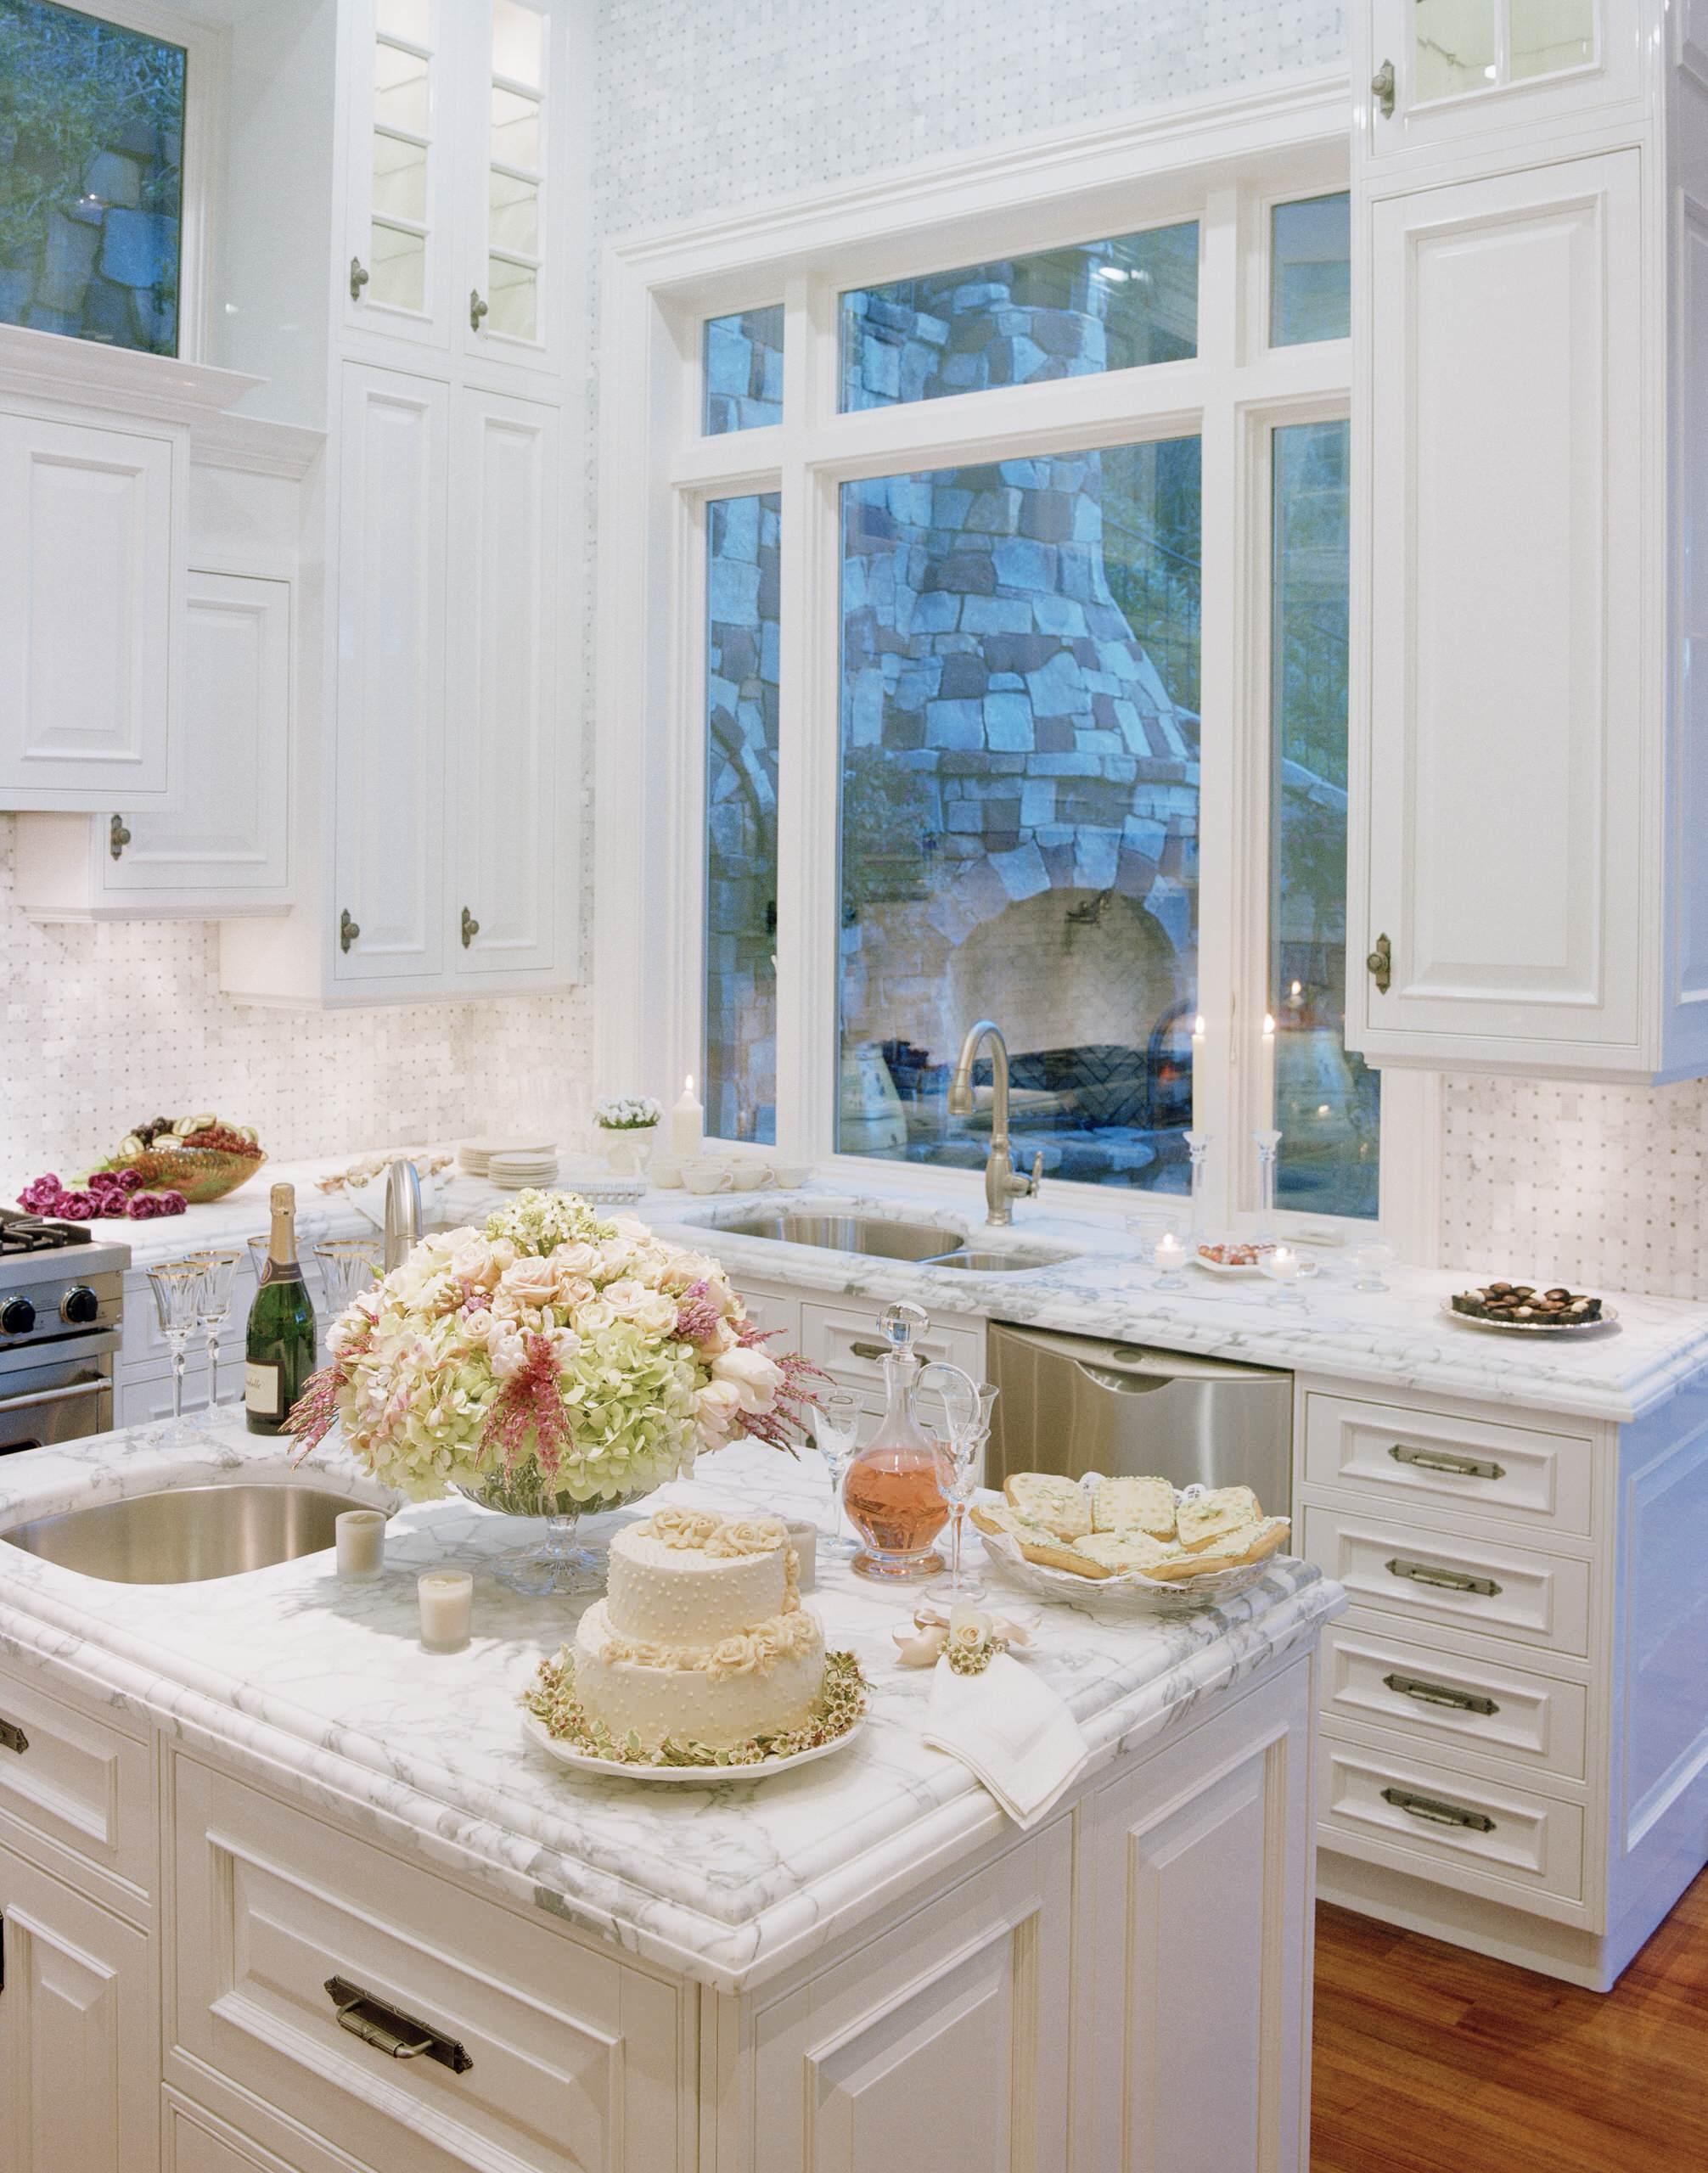 White Marble Countertops And Backsplash Ideas Photos Houzz